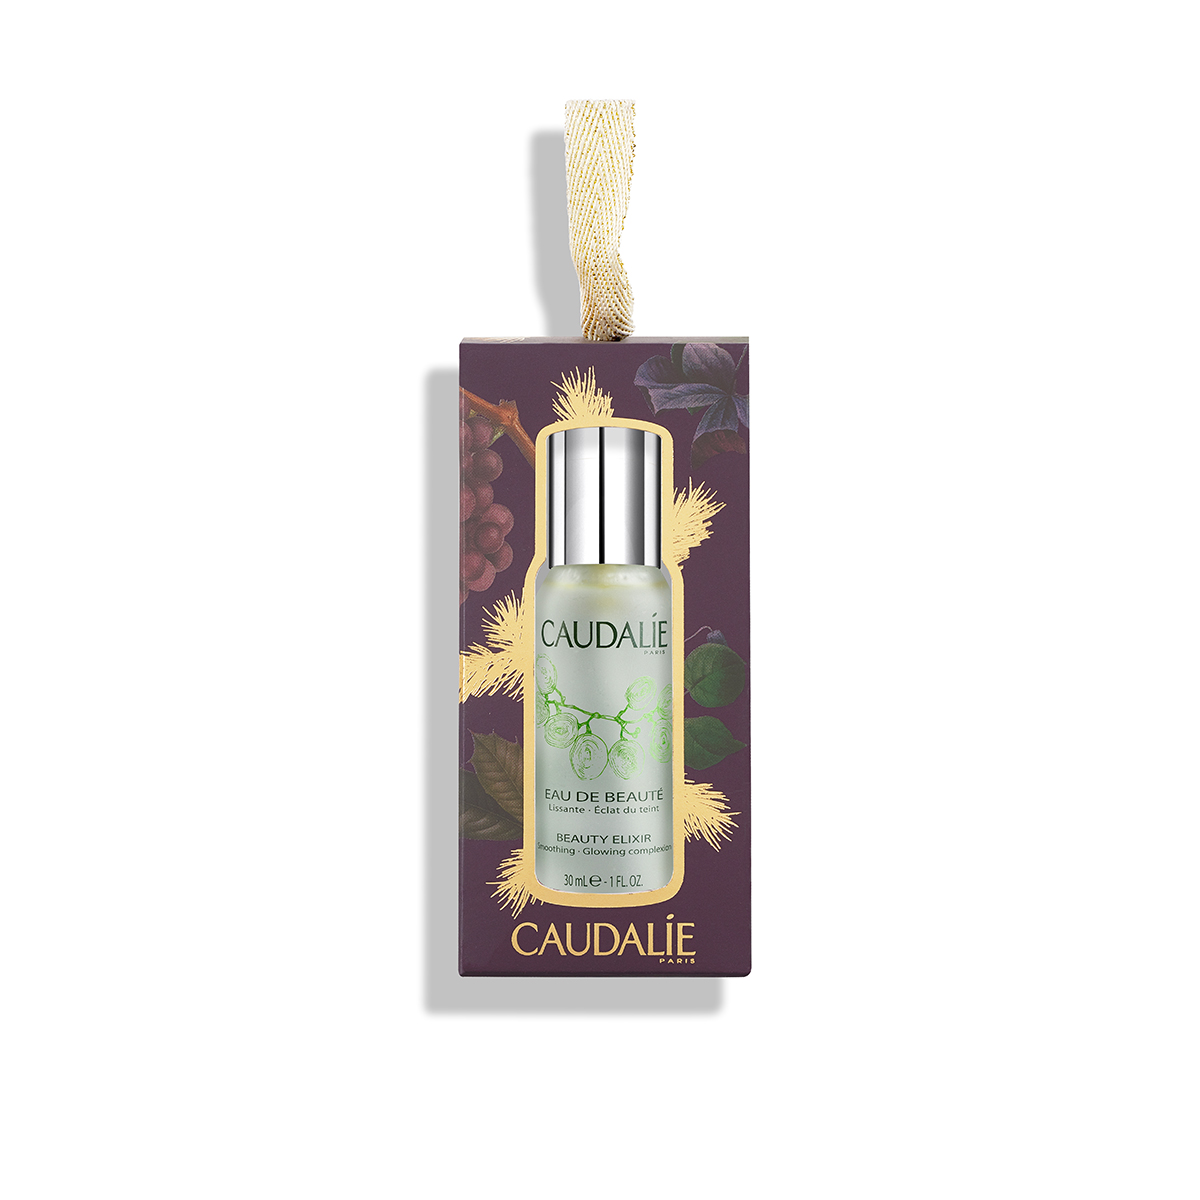 Beauty Elixir Mini Mist Bauble